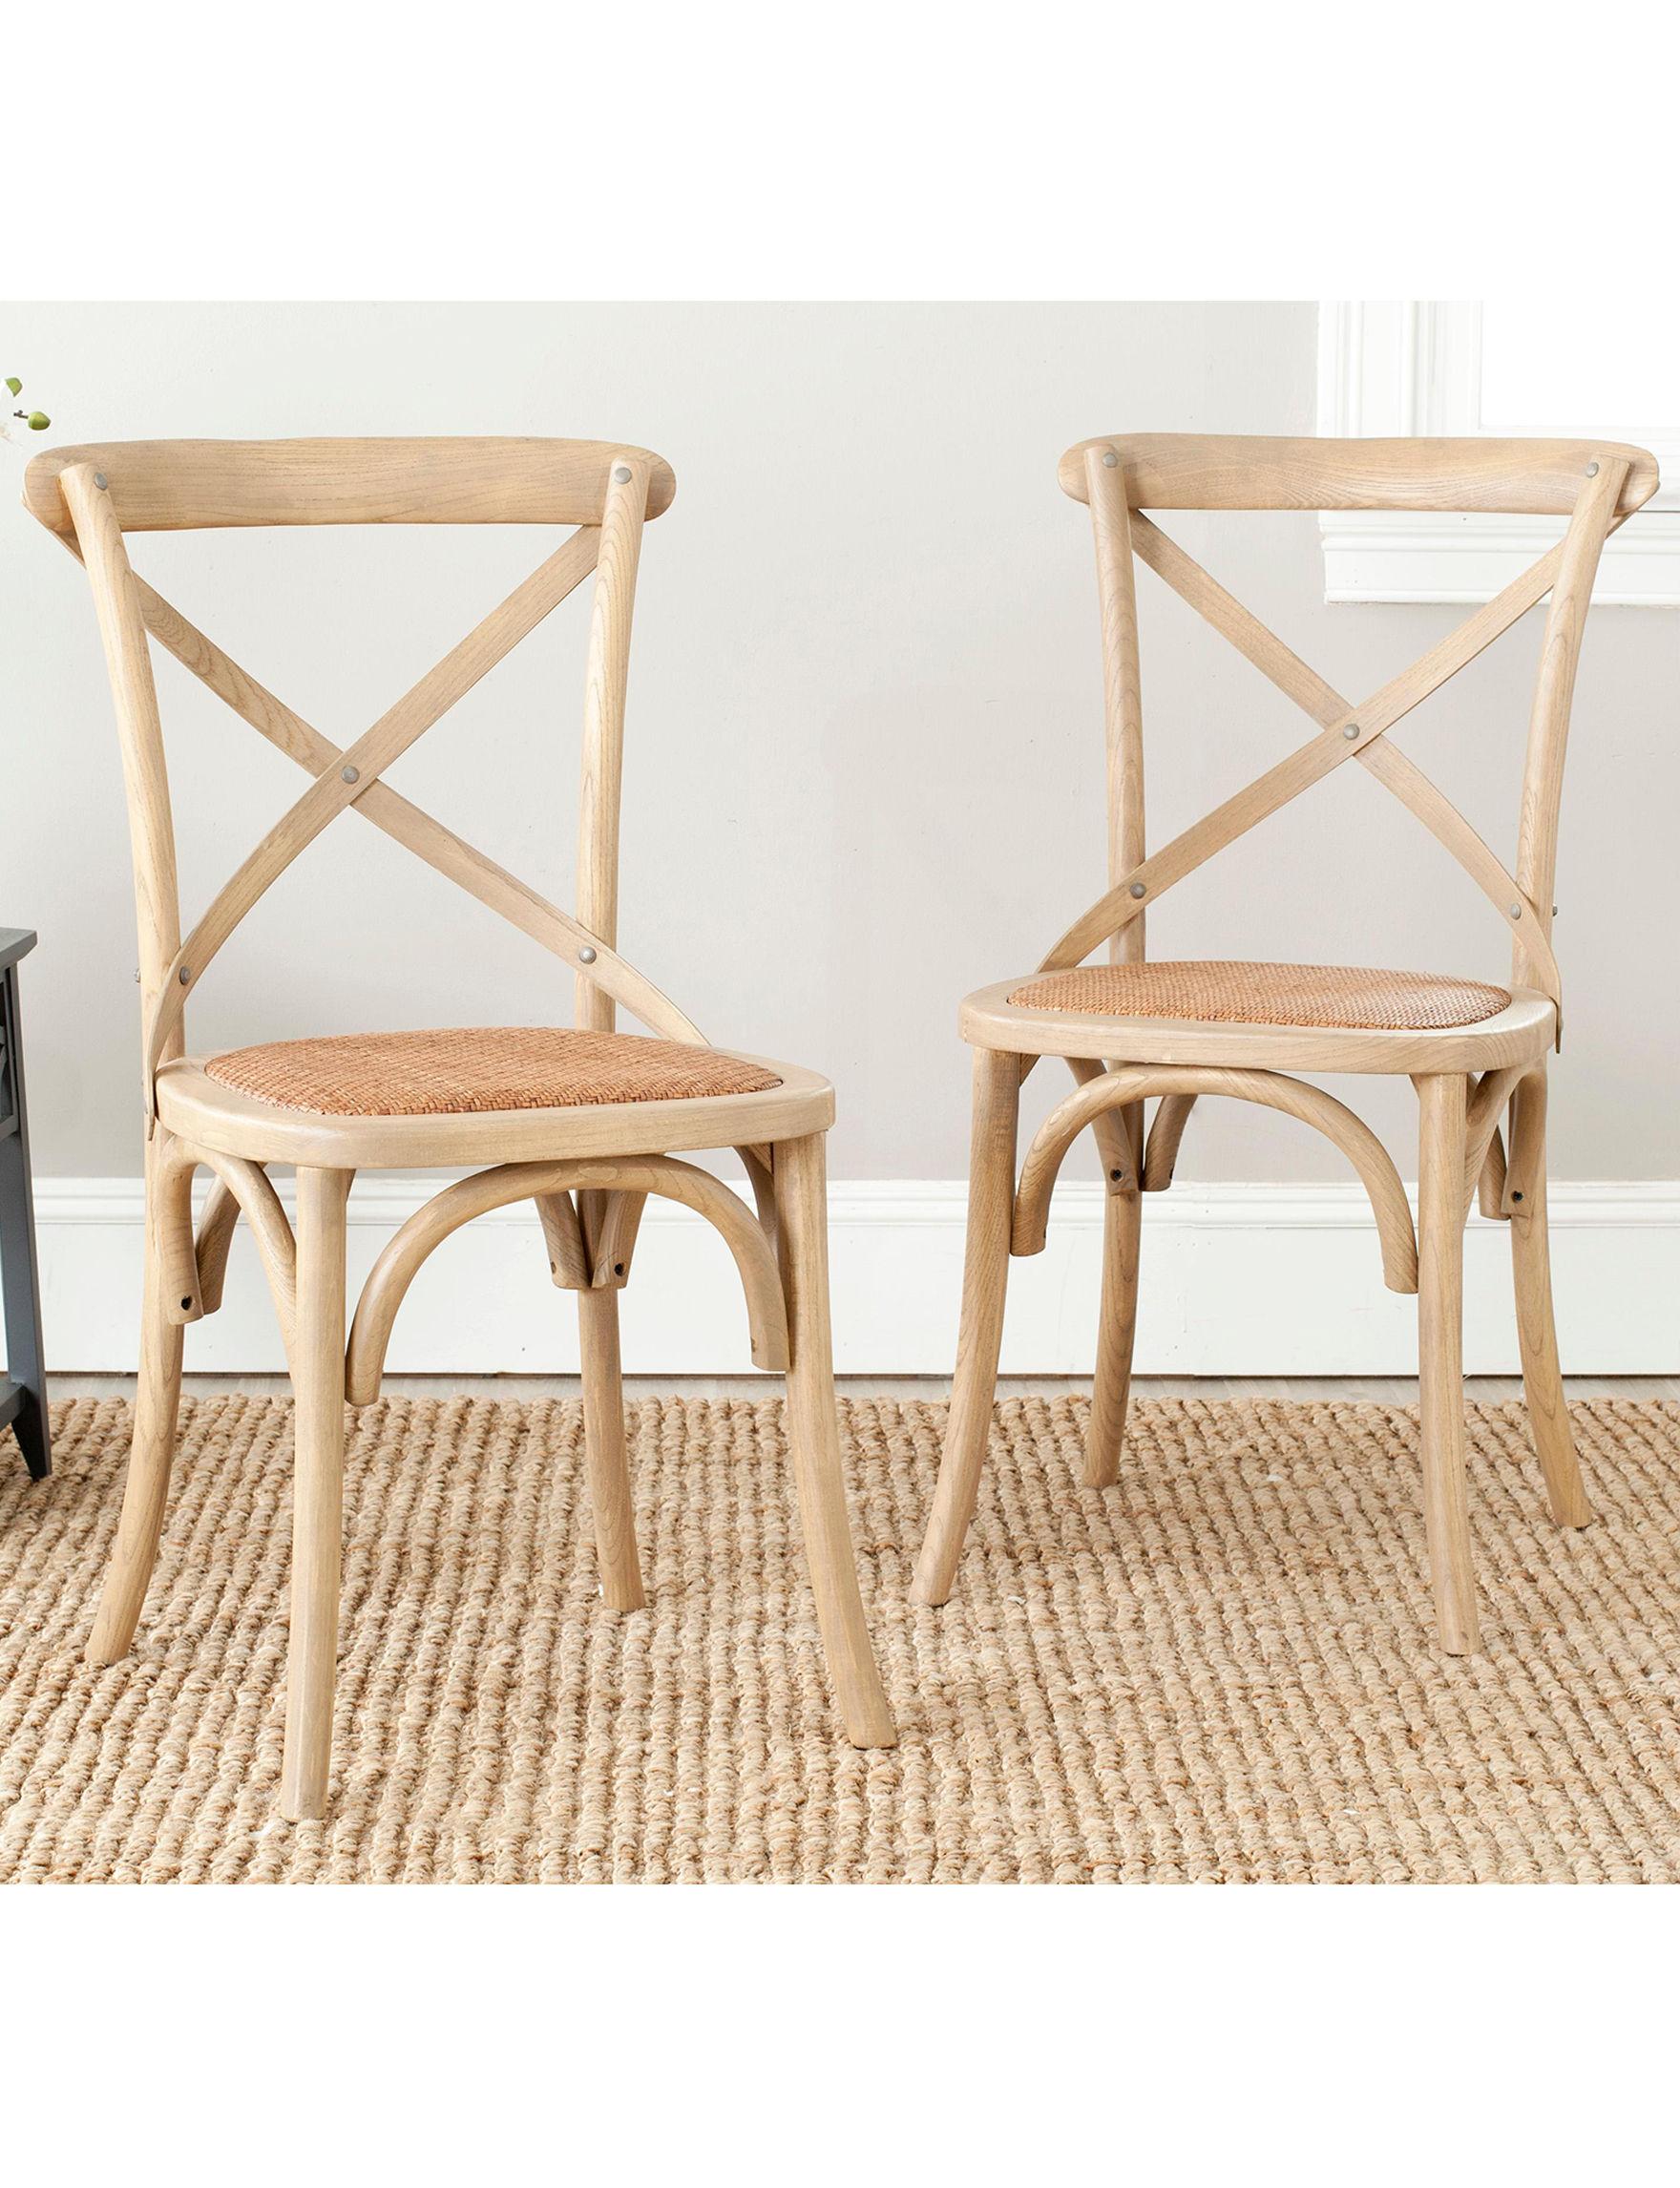 Safavieh Oak Dining Chairs Kitchen & Dining Furniture